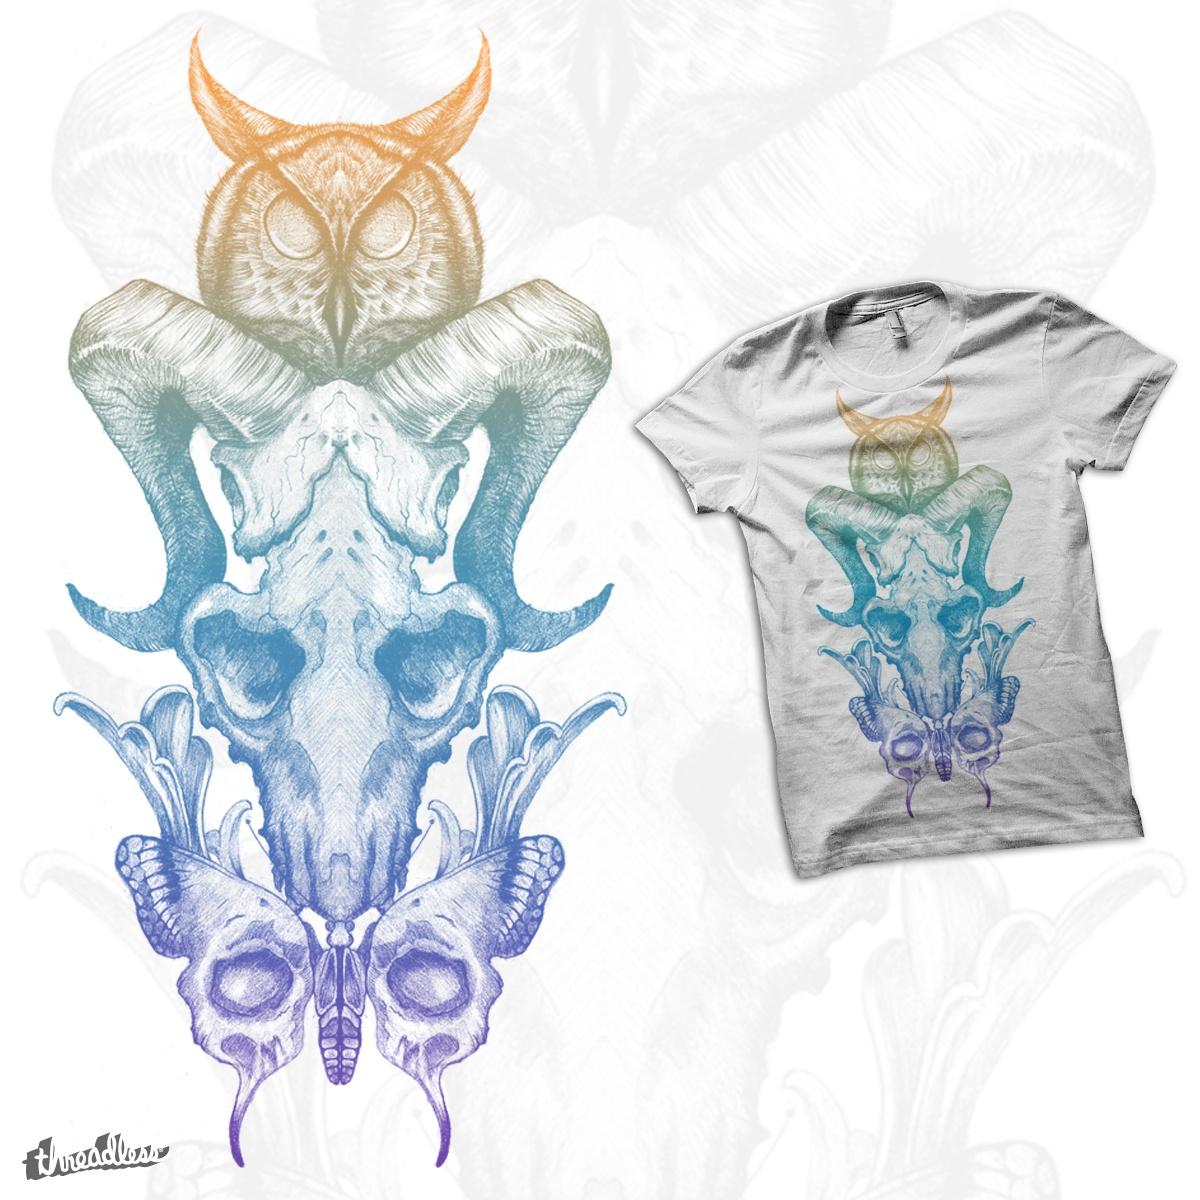 Owl & Skulls by oscarconejeros on Threadless